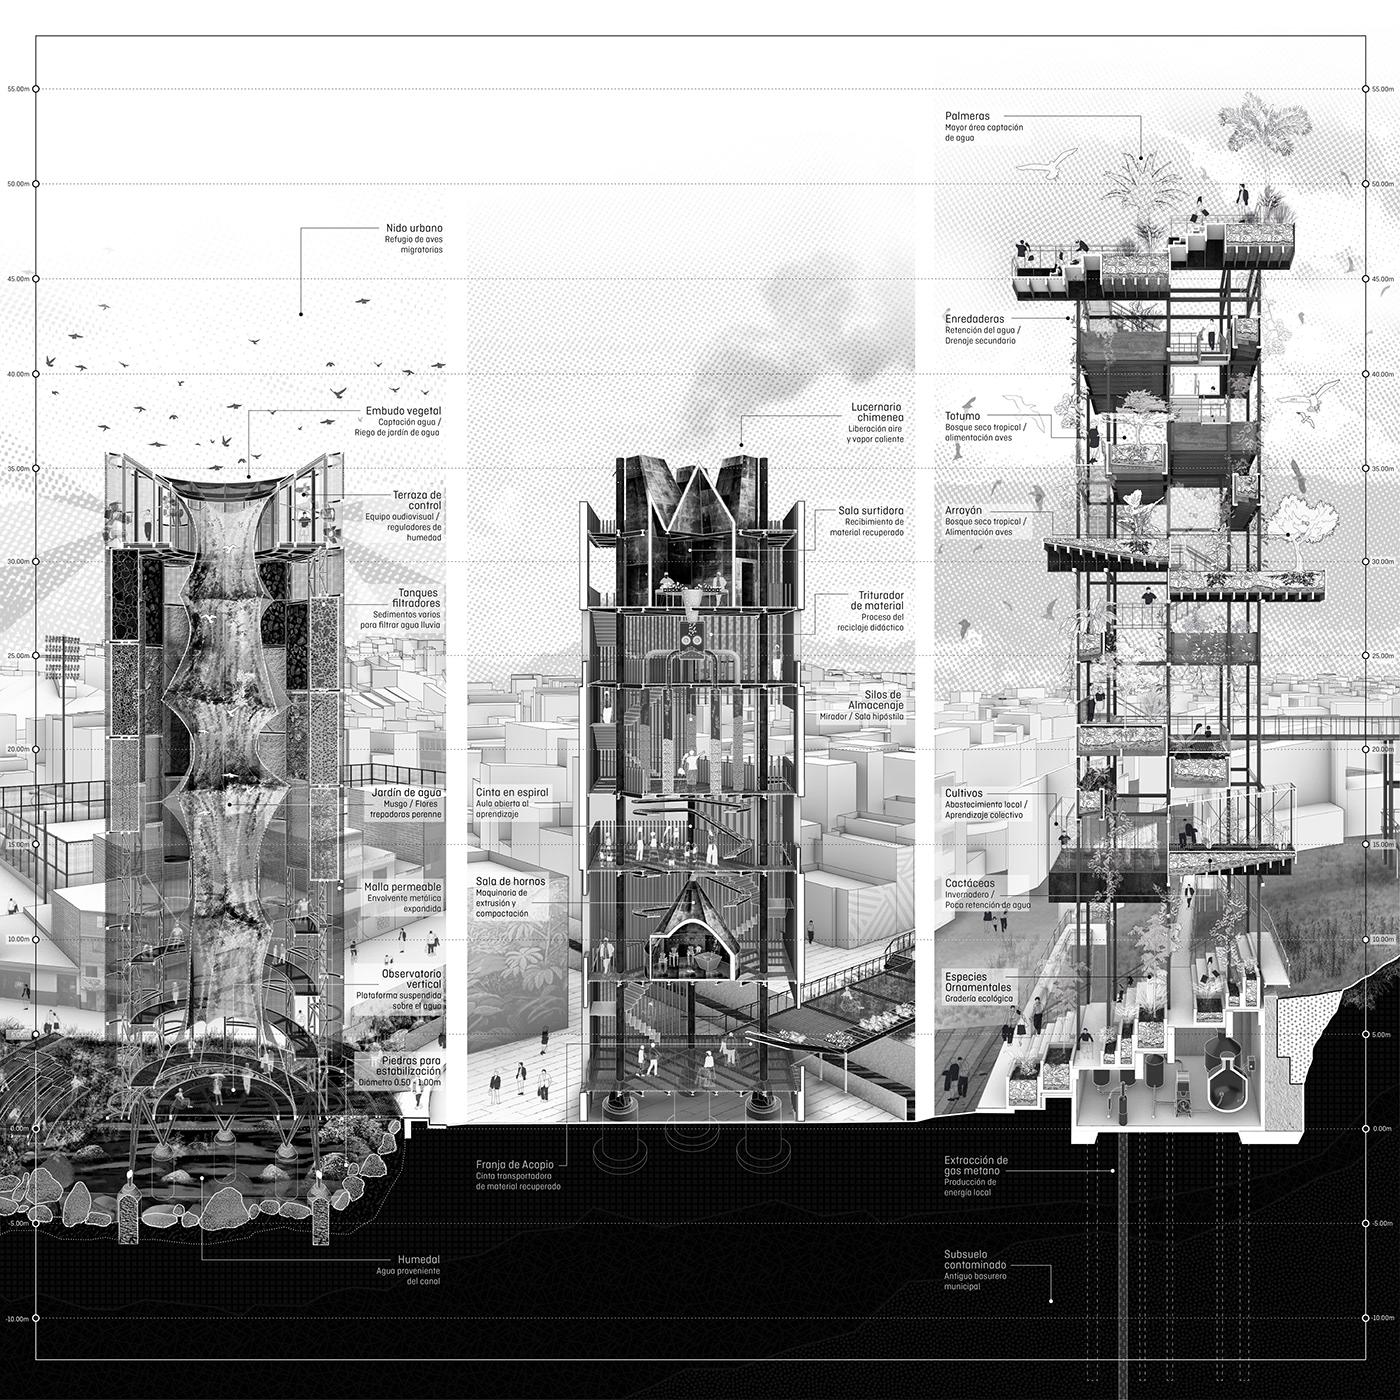 artifact garden Hypercluster infrastructure medellin Memory Moravia recycling tower vertical